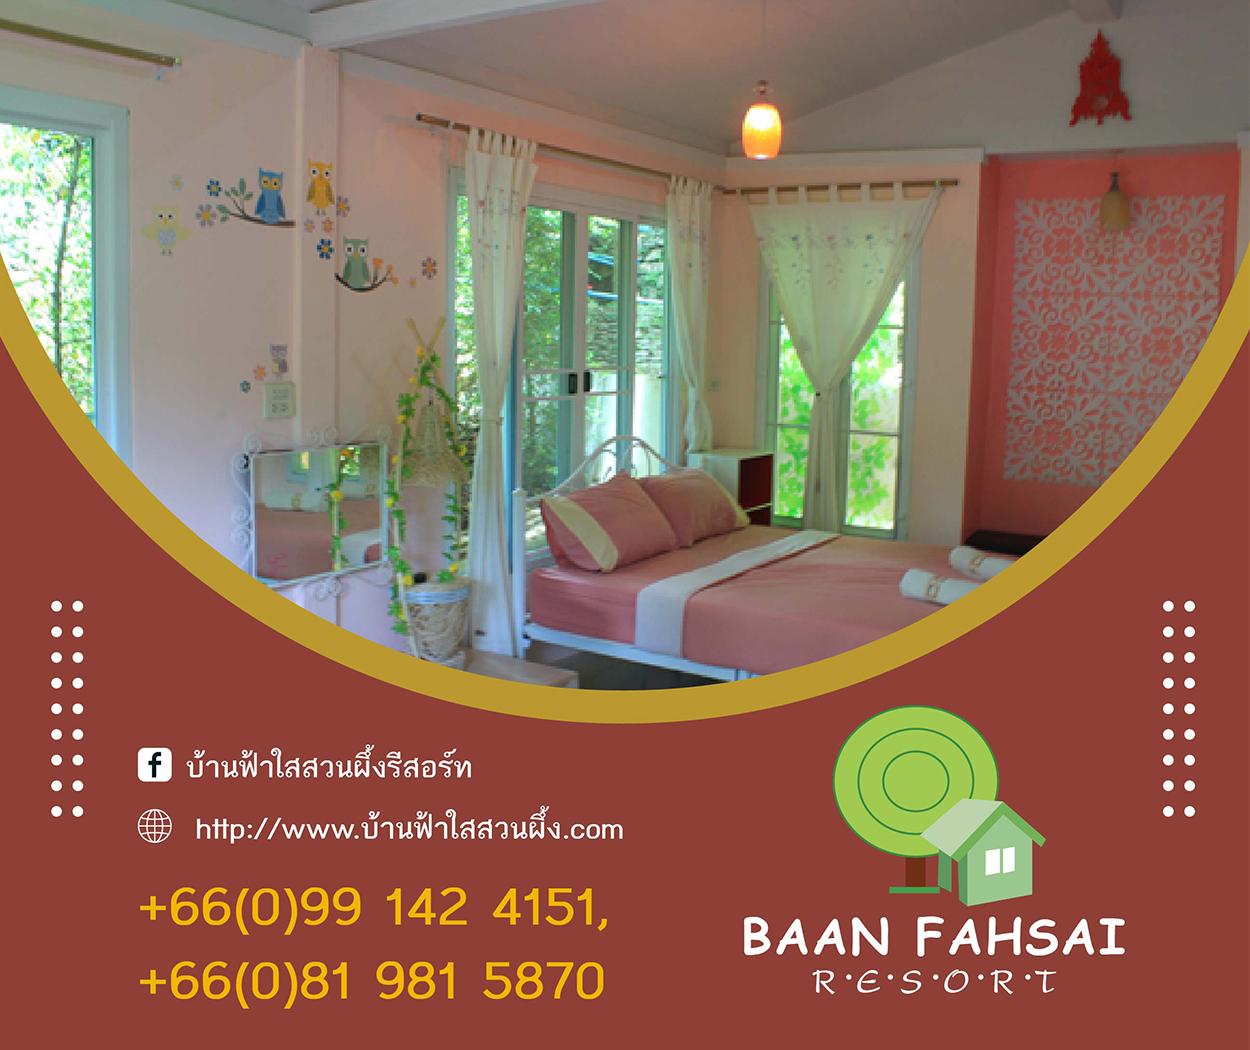 Baan Fahsai Resort Ratchaburi